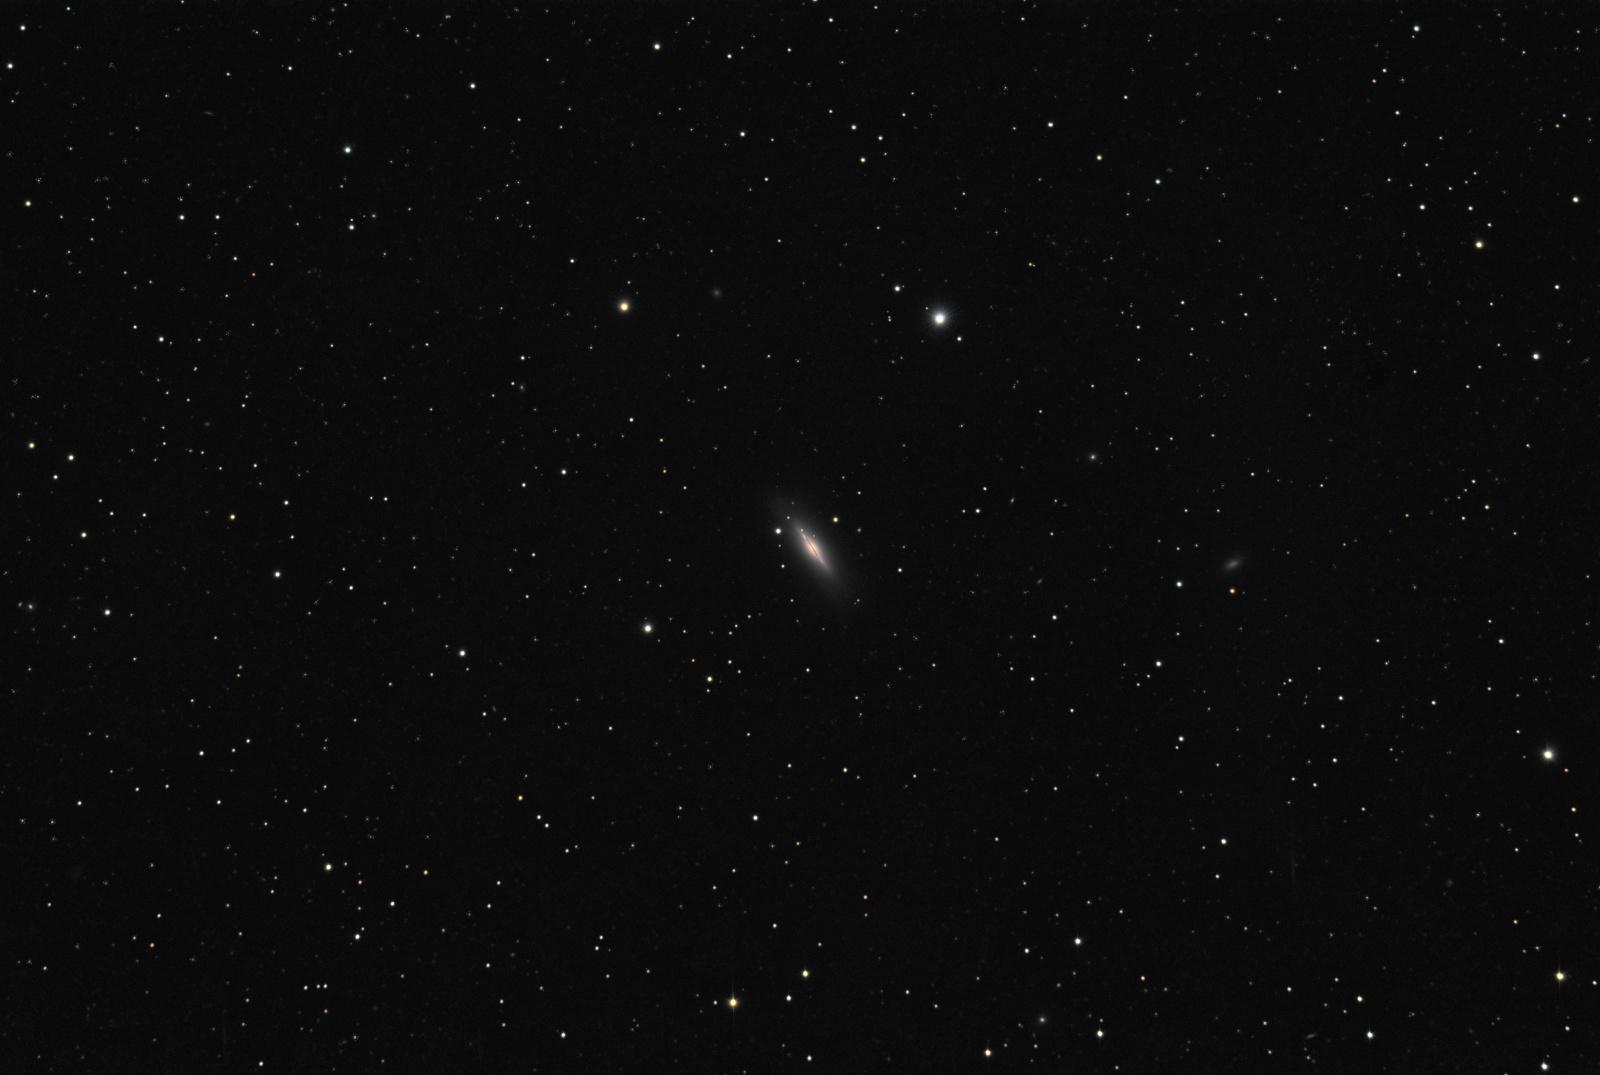 M102.thumb.jpg.072695f23524ed2f48685197fb9b9771.jpg